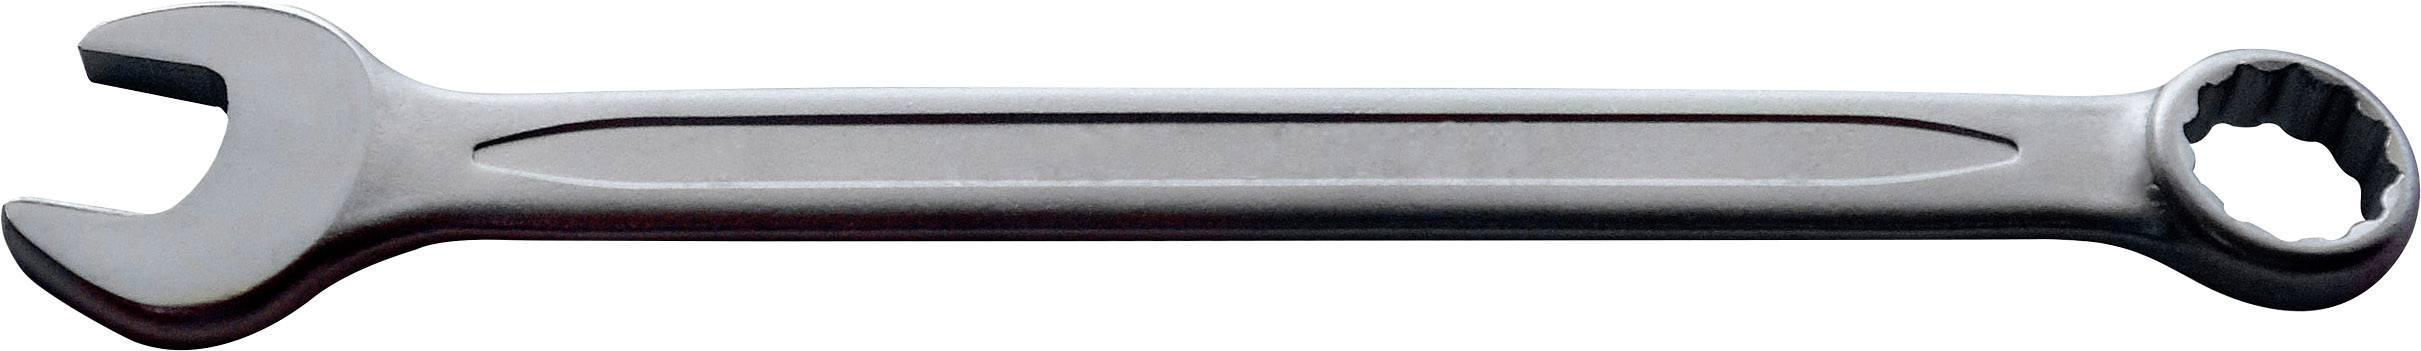 Očkoplochý klíč TOOLCRAFT 820837, N/A, 14 mm